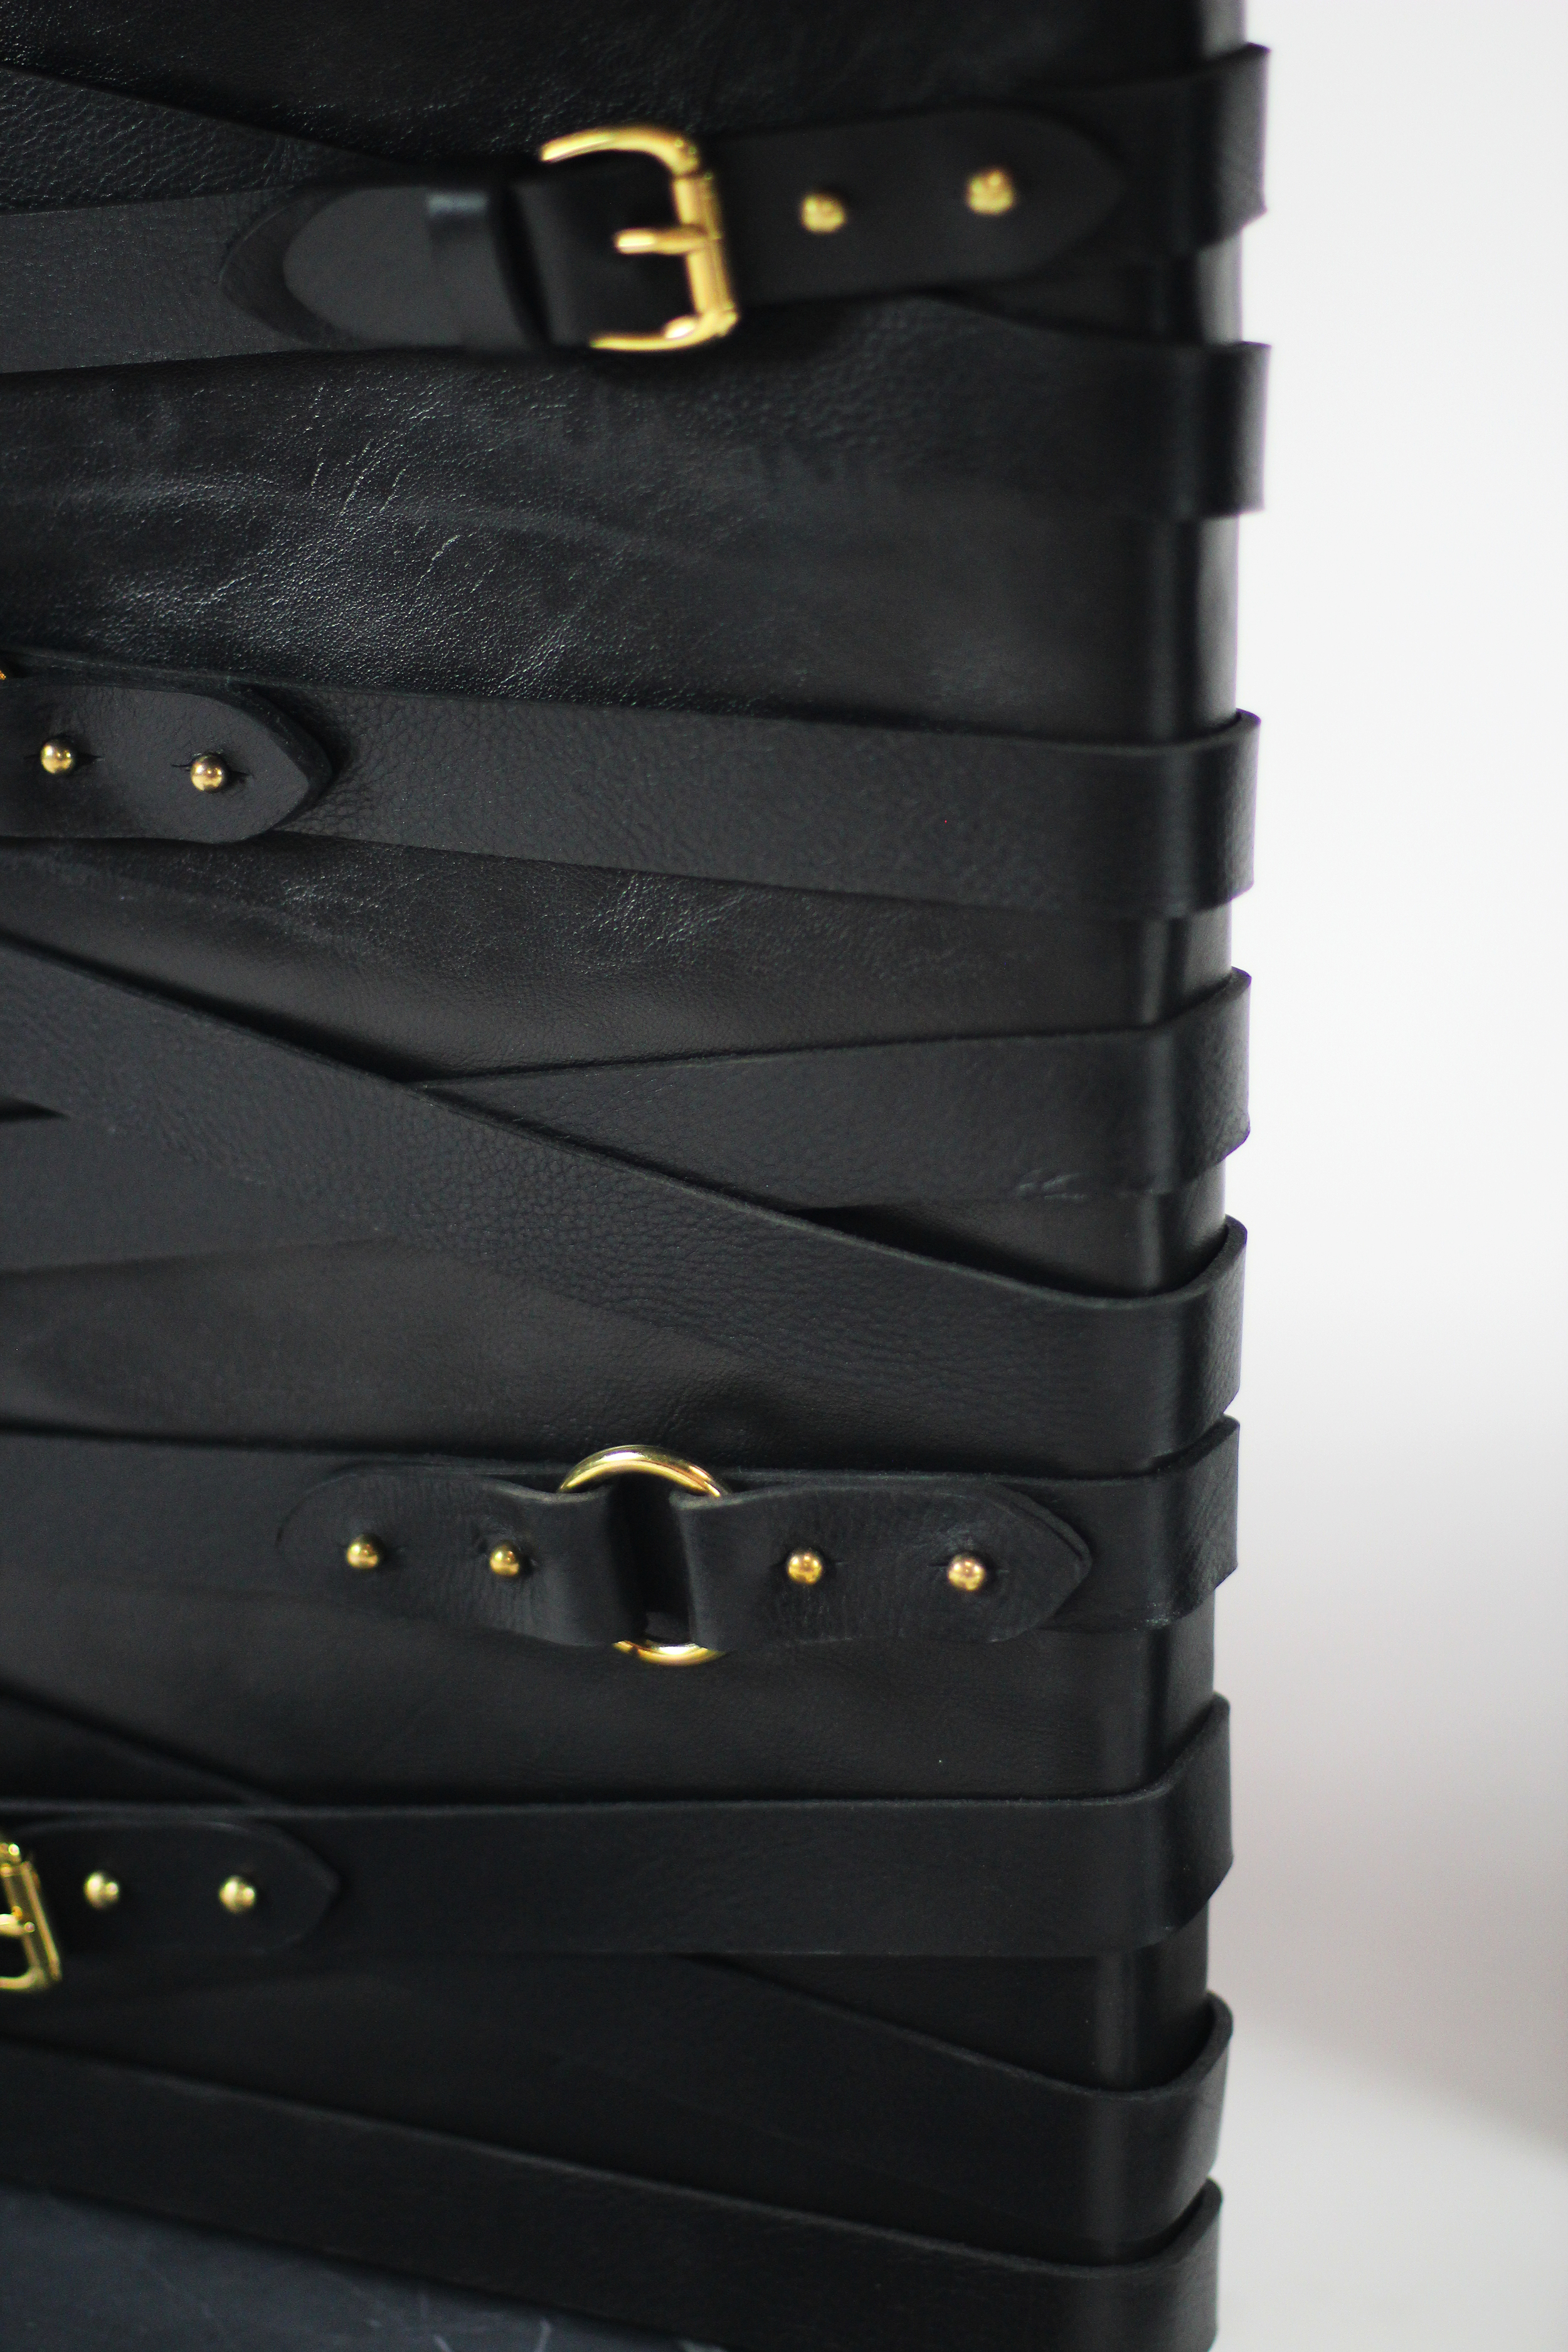 Restraint Nightstand Leather Panel Detail.jpg